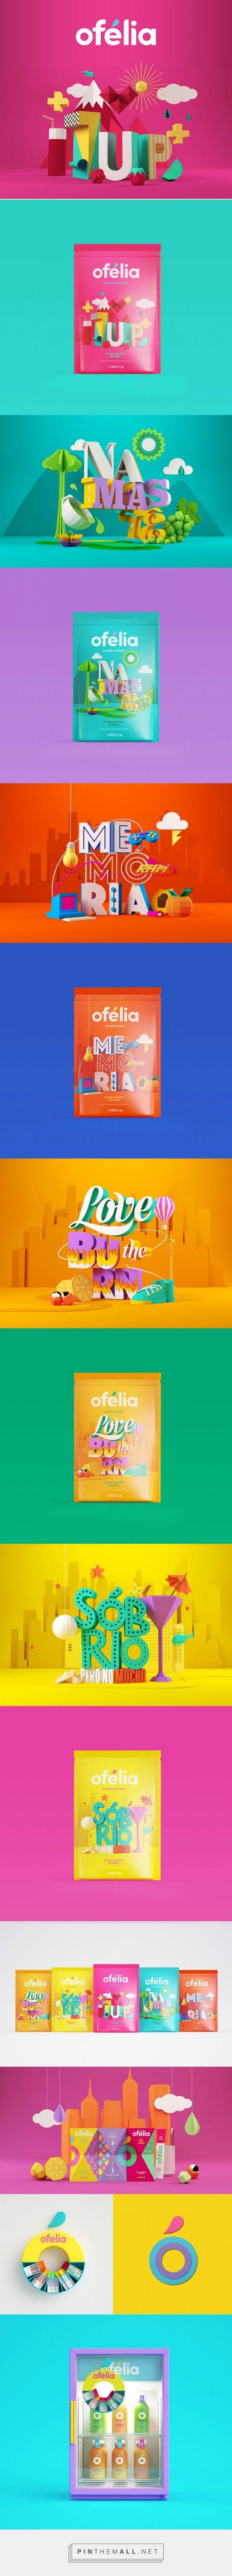 Ofelia - Packaging of the World - Creative Package Design Gallery - http://www.packagingoftheworld.com/2016/01/ofelia.html